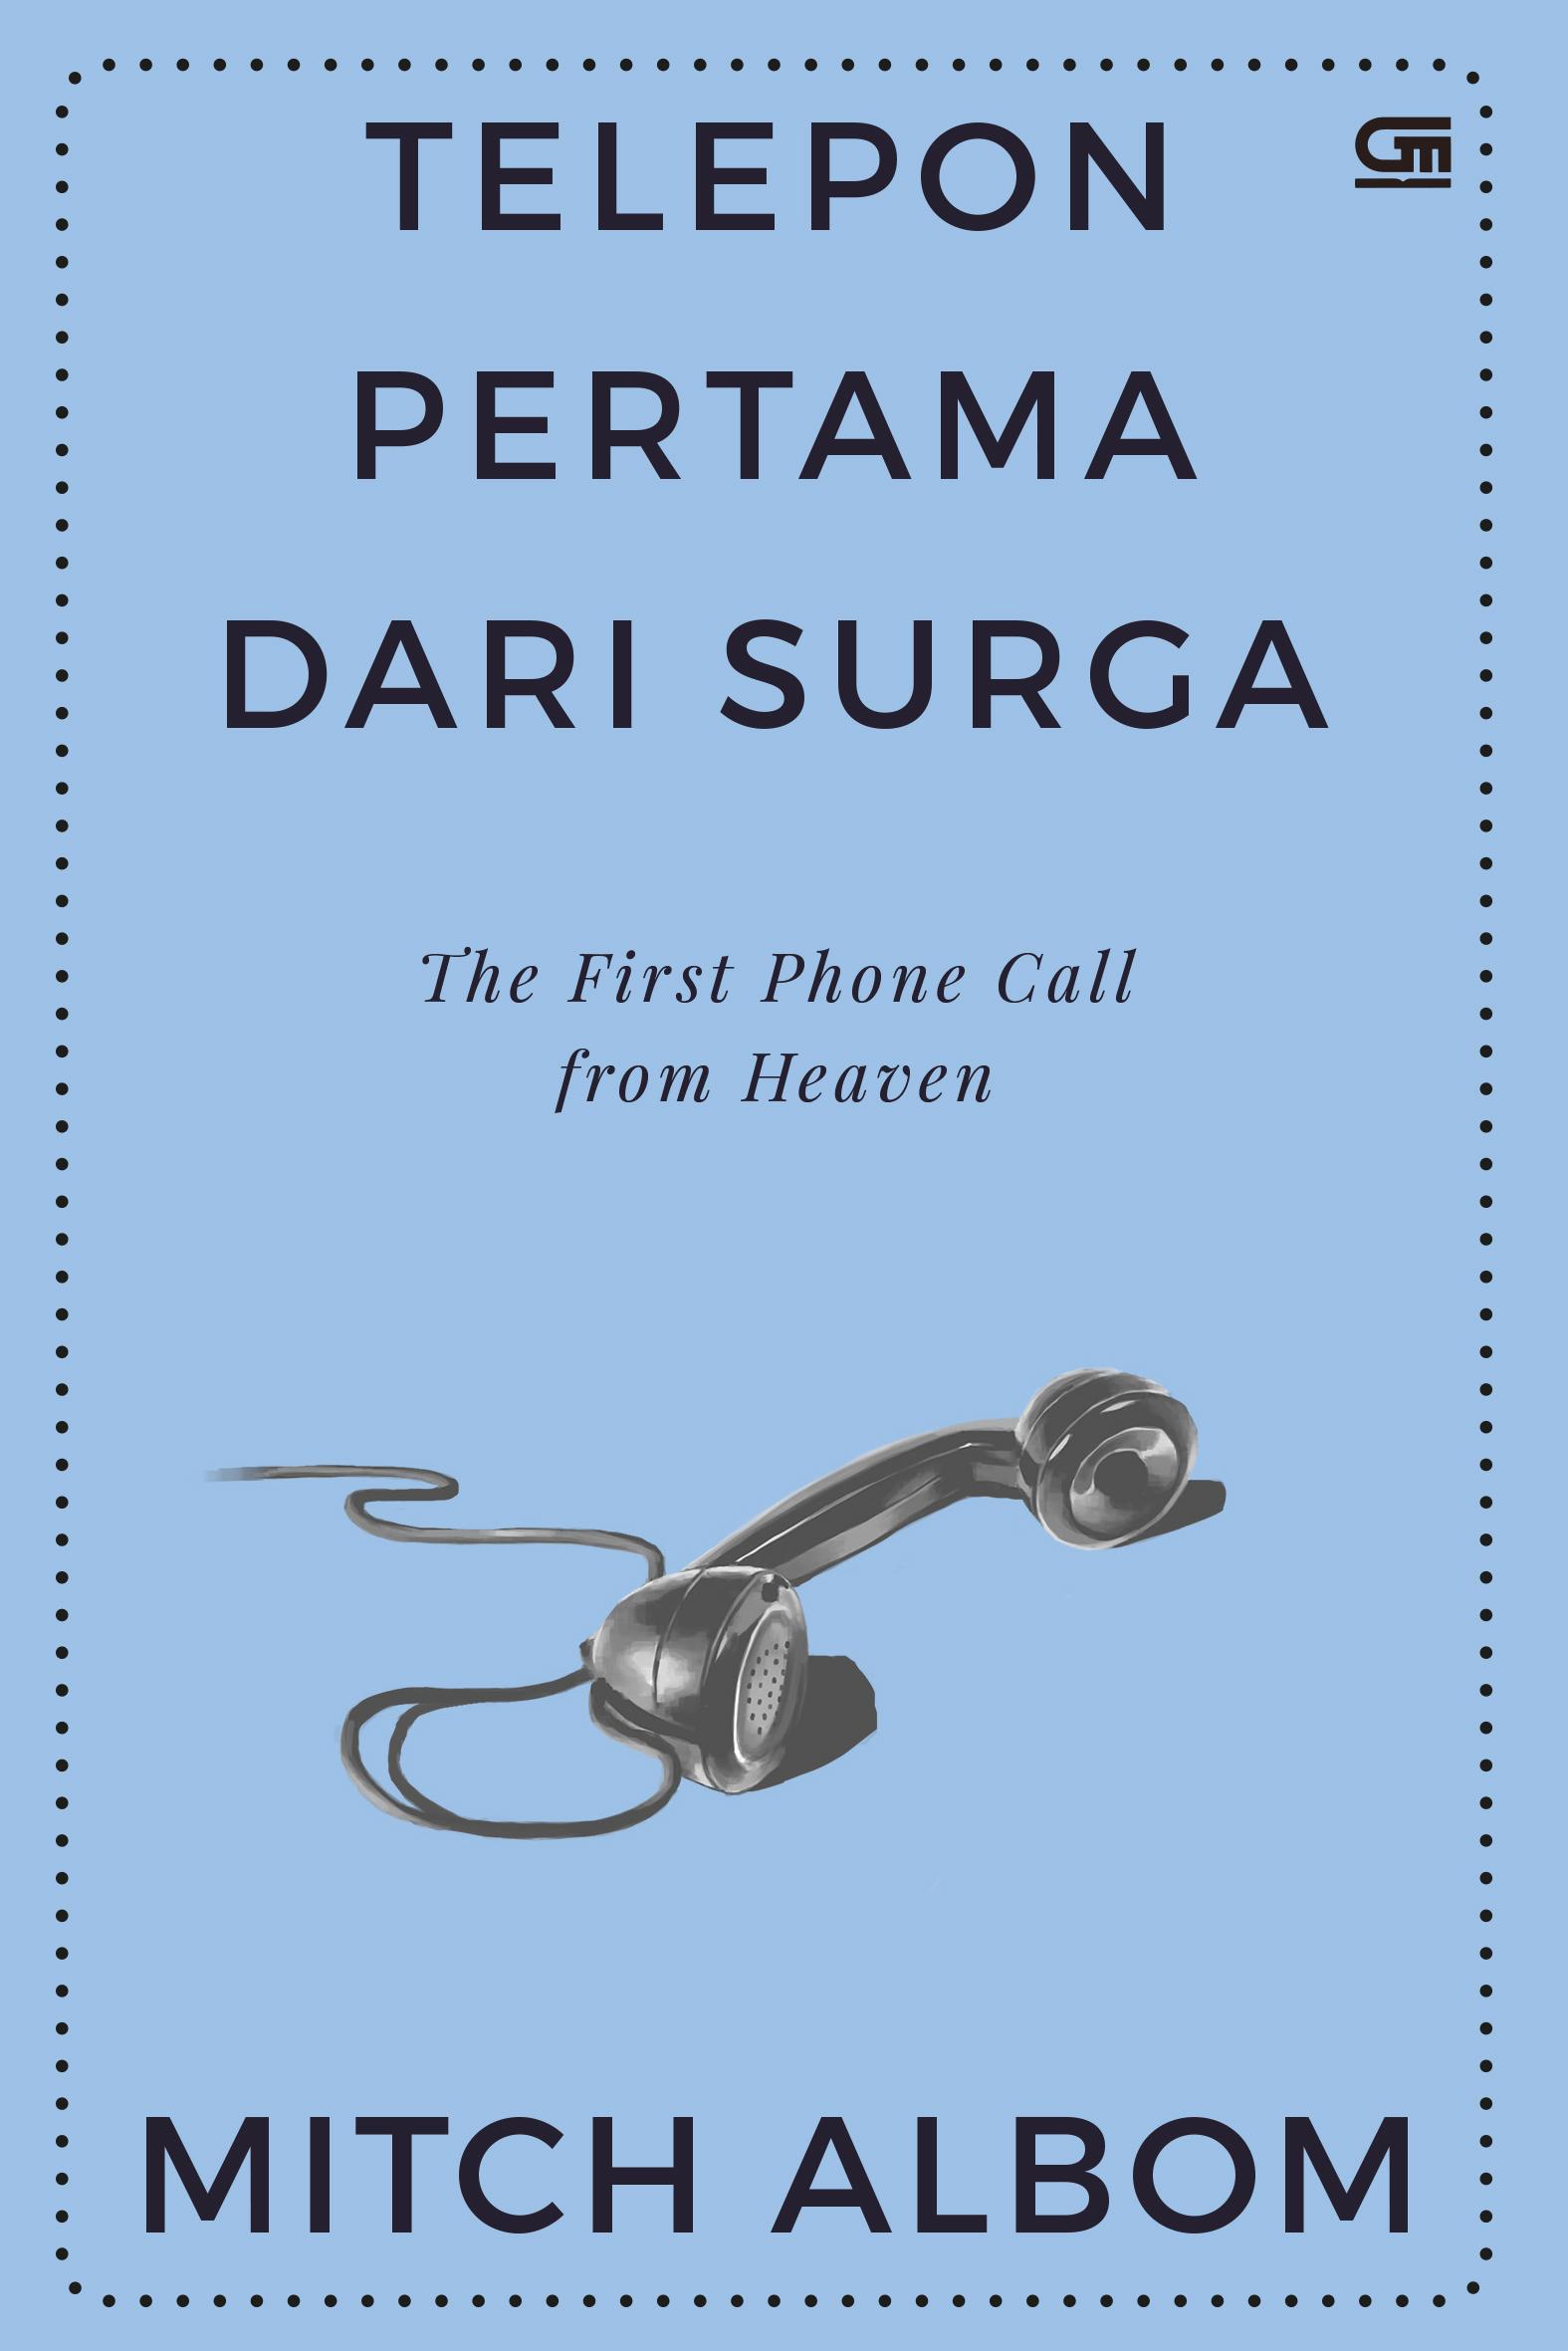 Telepon Pertama dari Surga (The First Phone Call from Heaven)